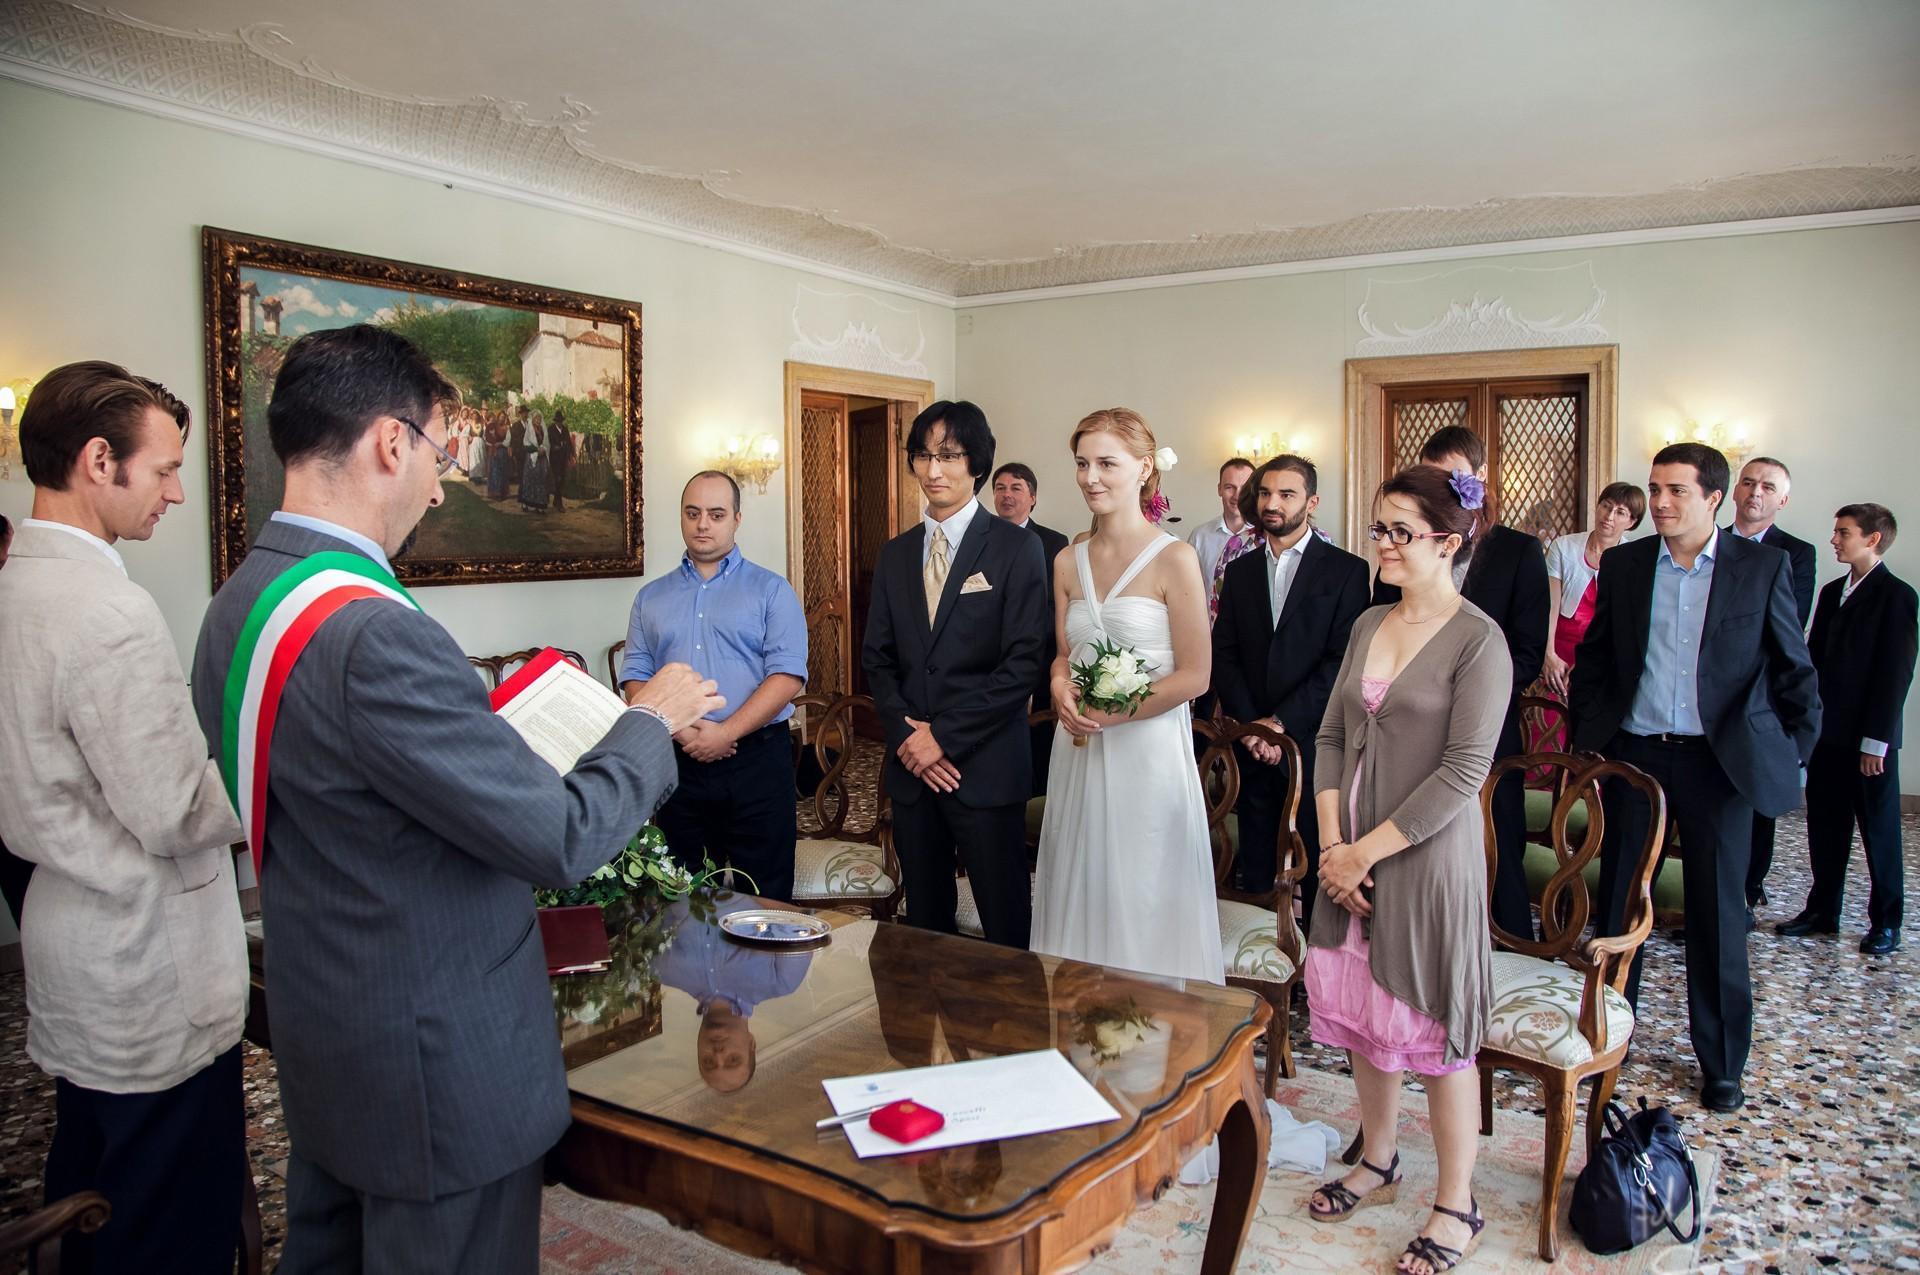 Ślub w wenecji 30 Manuela Luiza & Young Seon Song